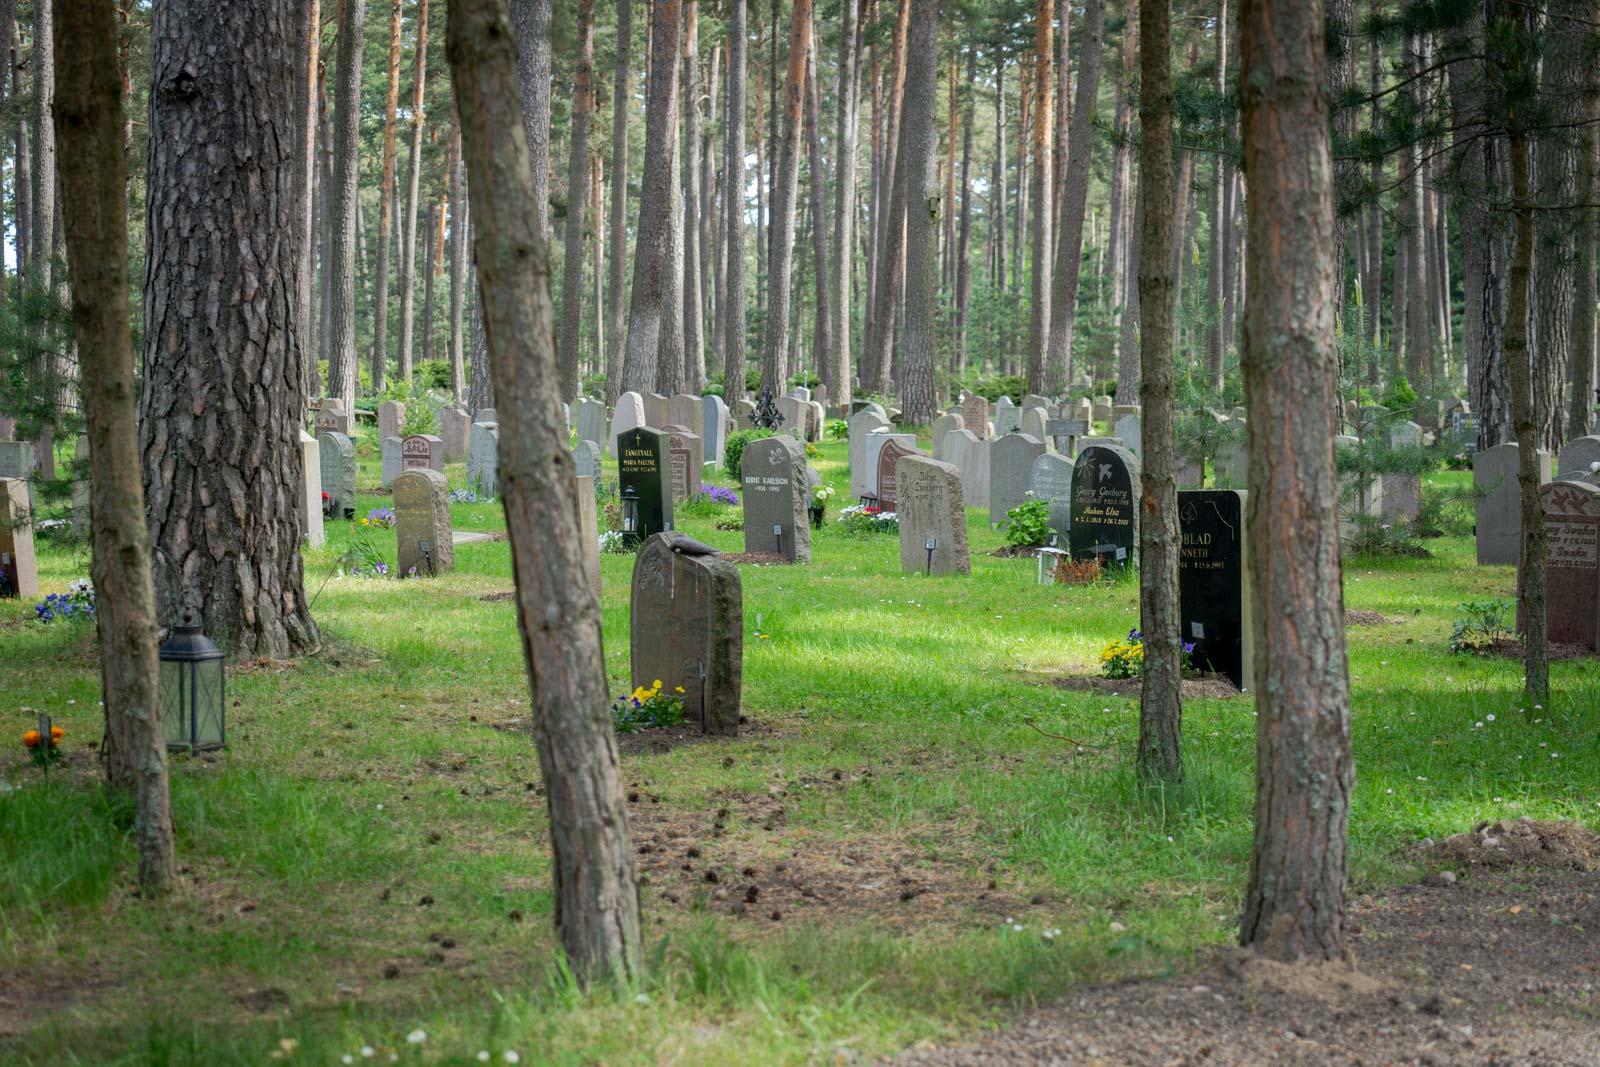 Skogskyrkogarden, The Woodland Cemetery, Stockholm, Sweden